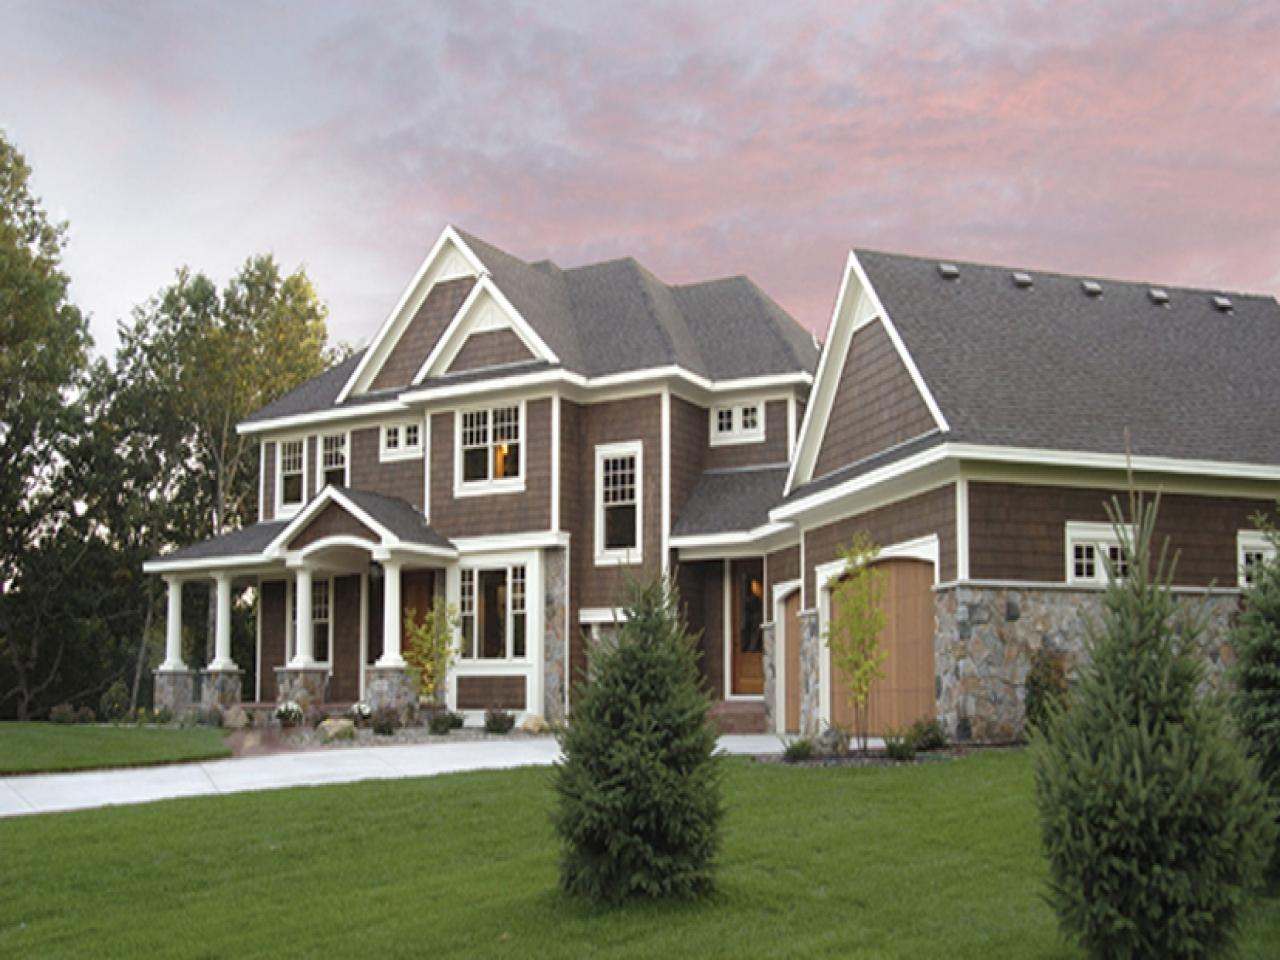 exterior paint colors with white trim photo - 1